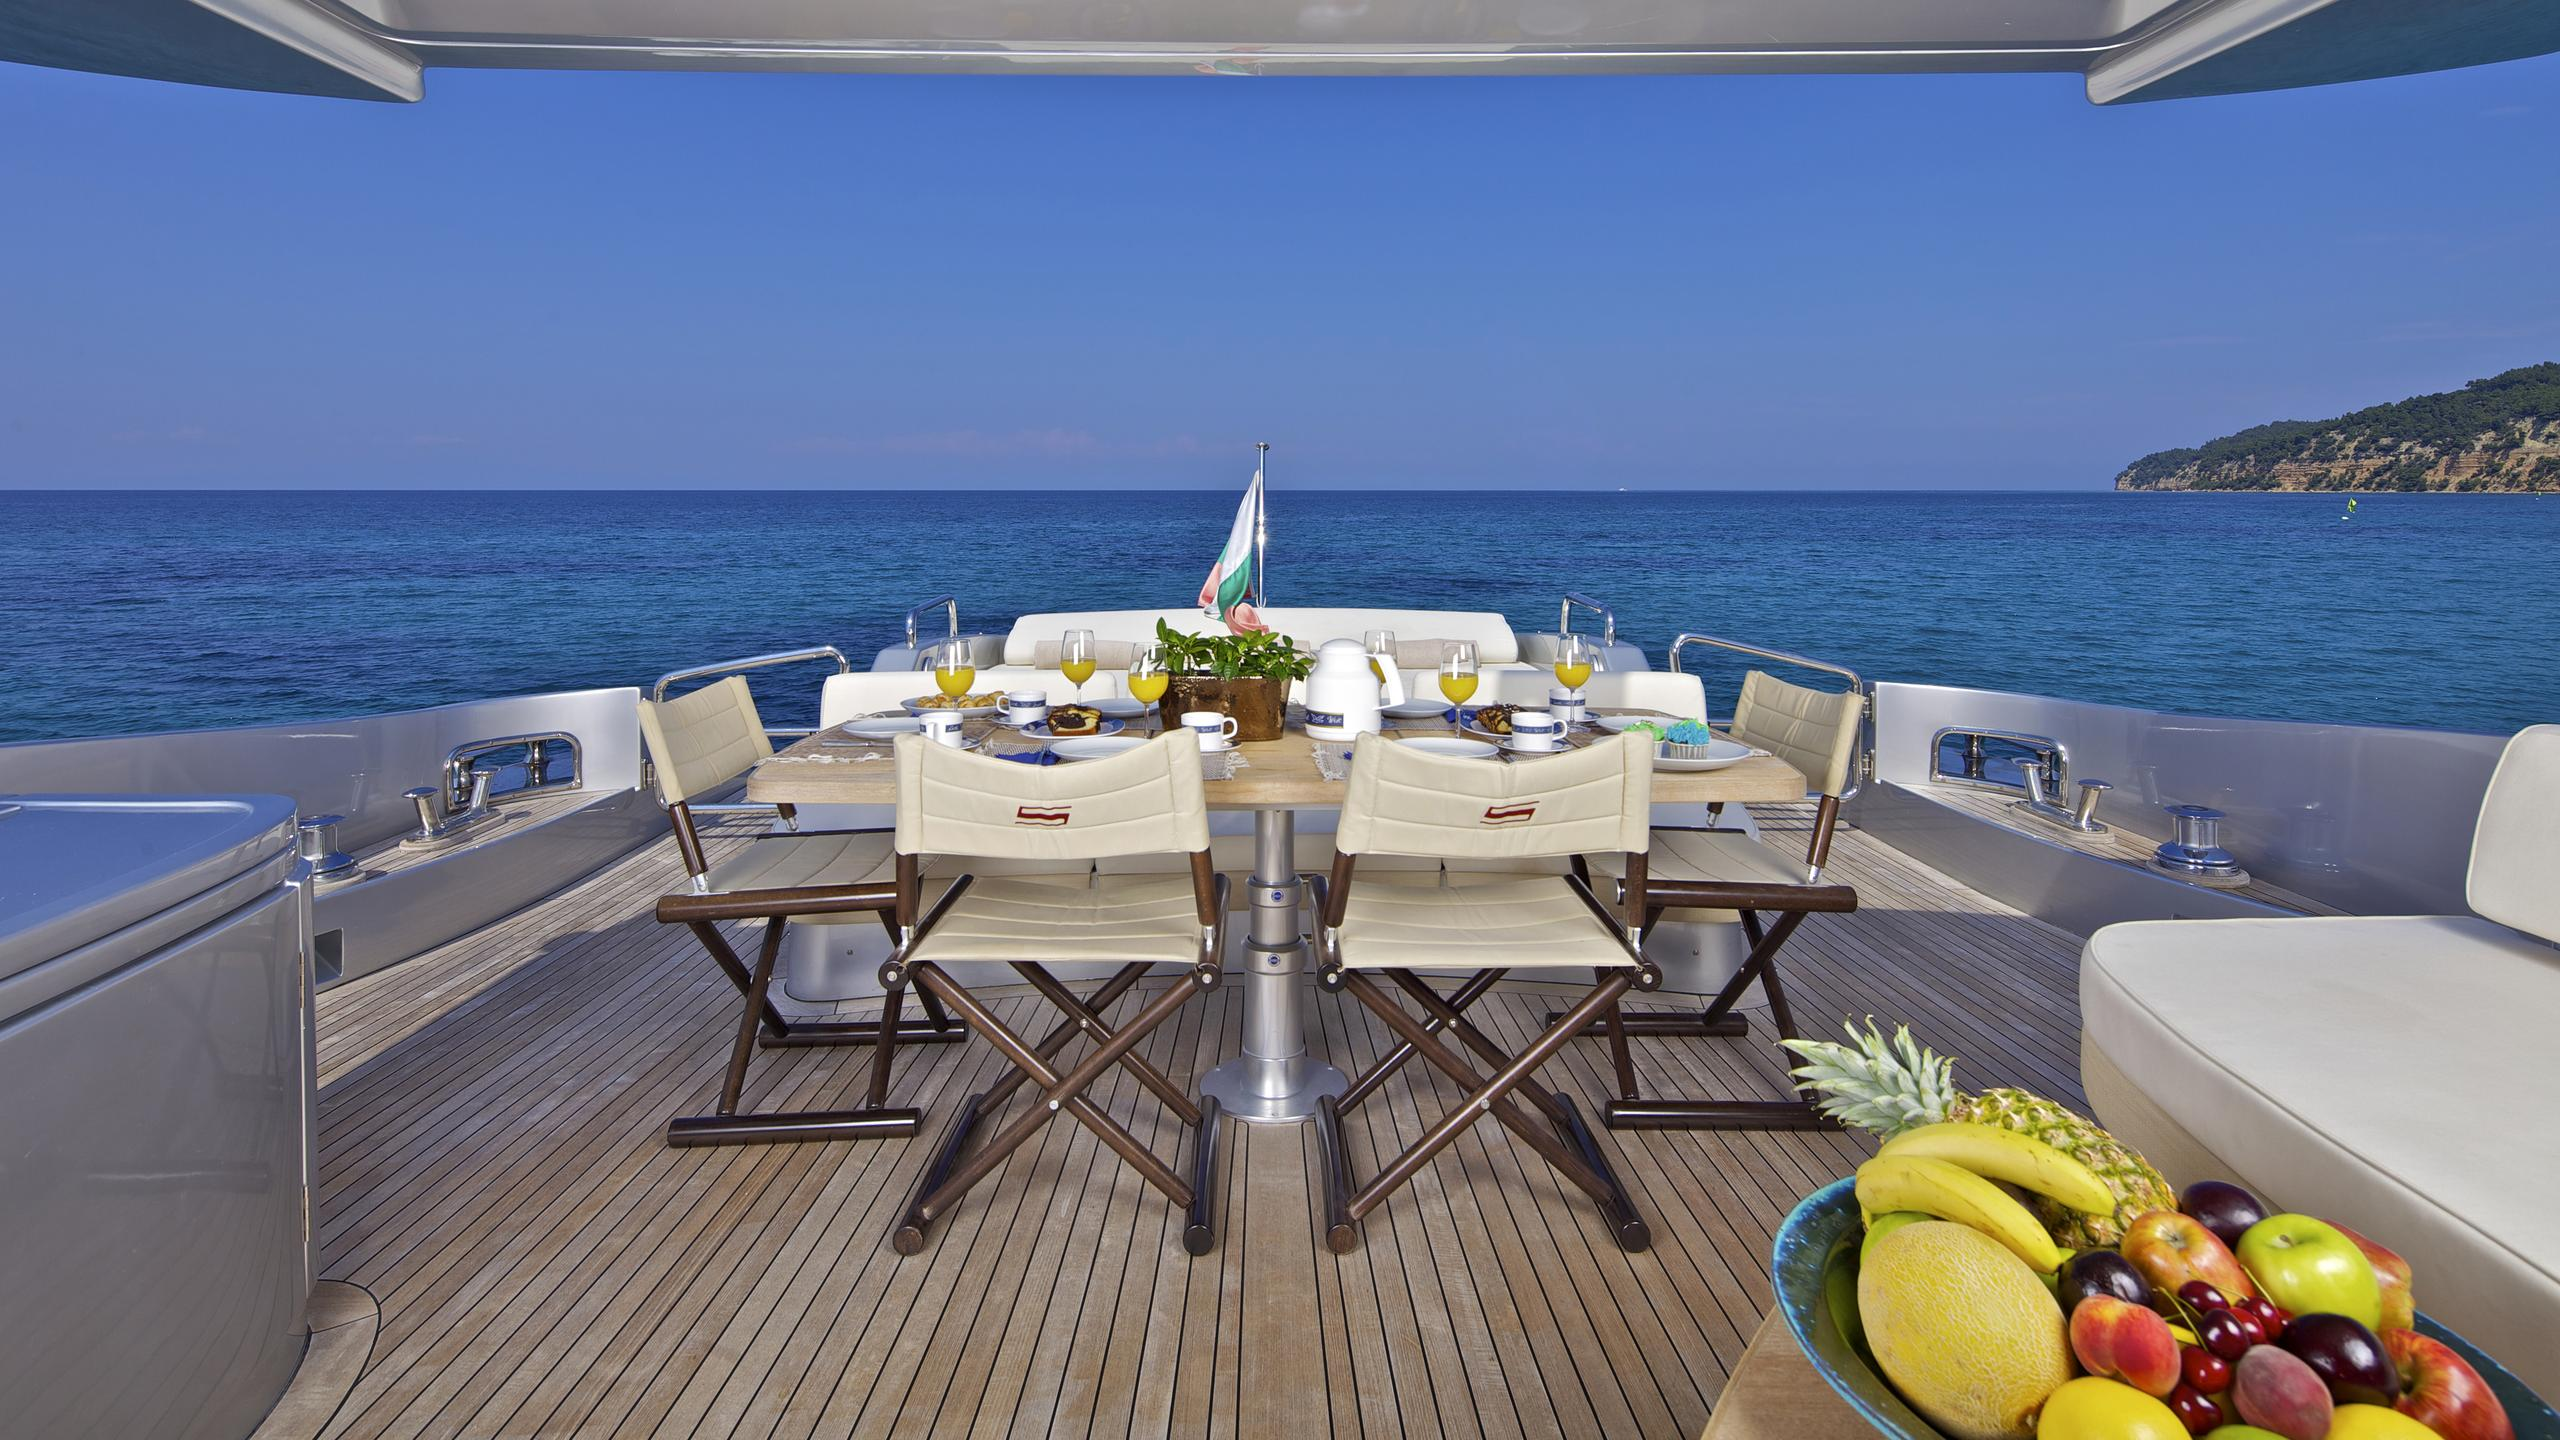 thea-malta-yacht-aft-dining